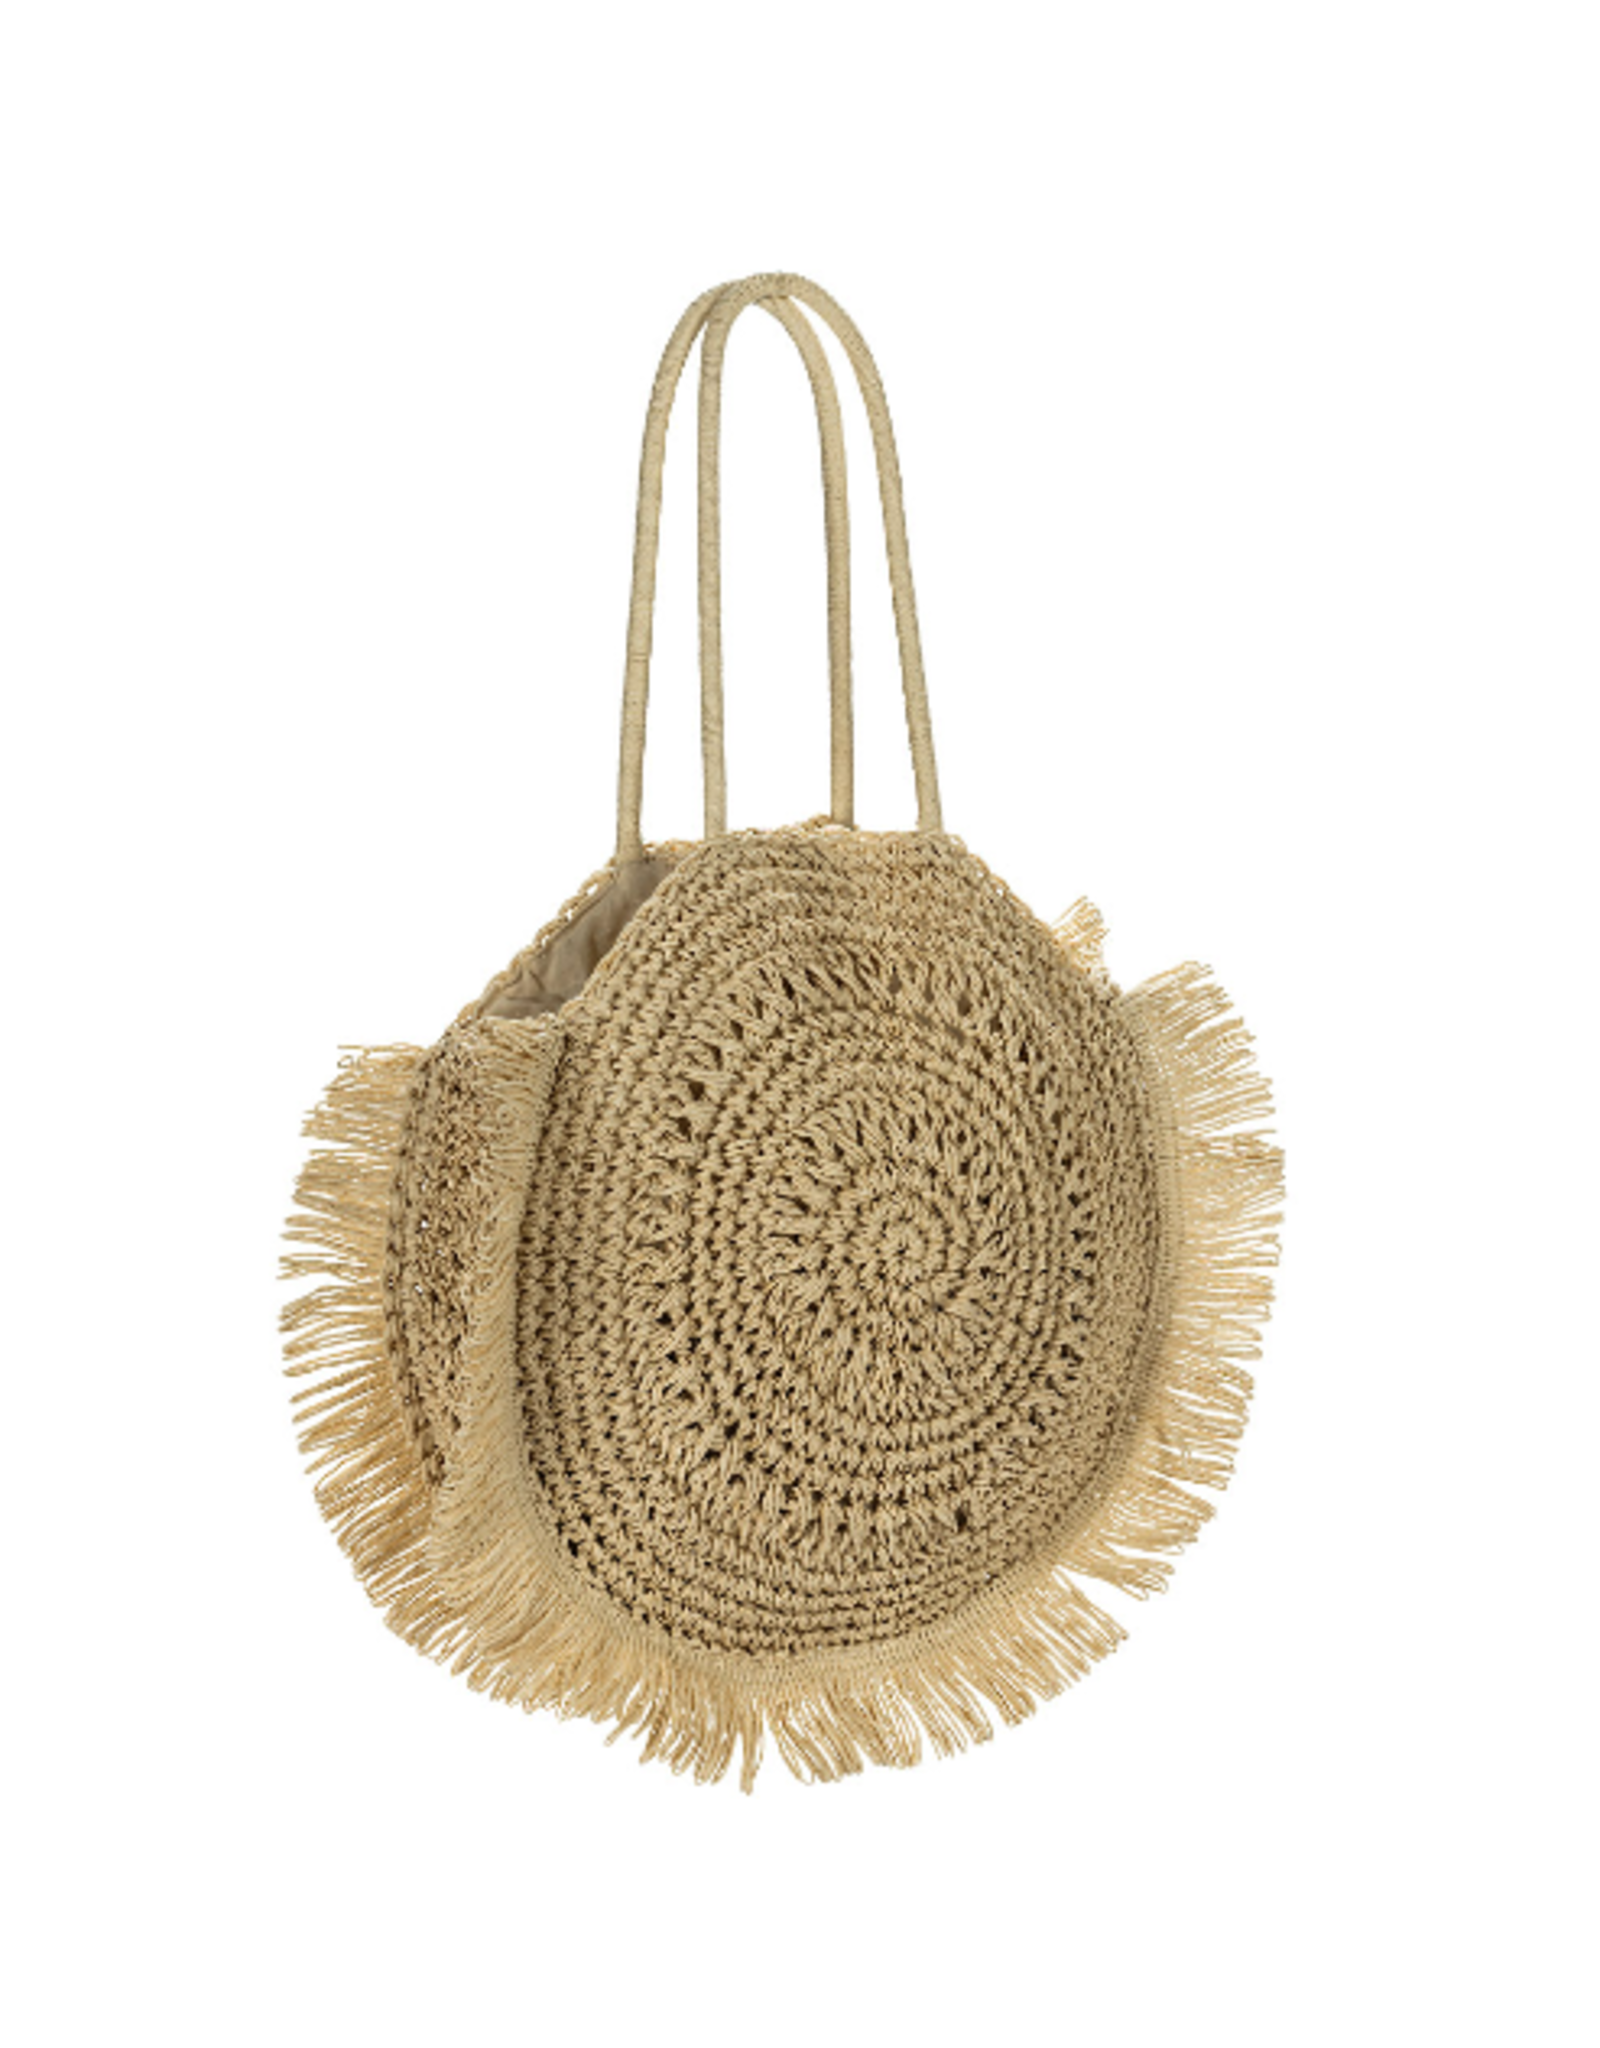 Abbott Round Crochet Tote Bag